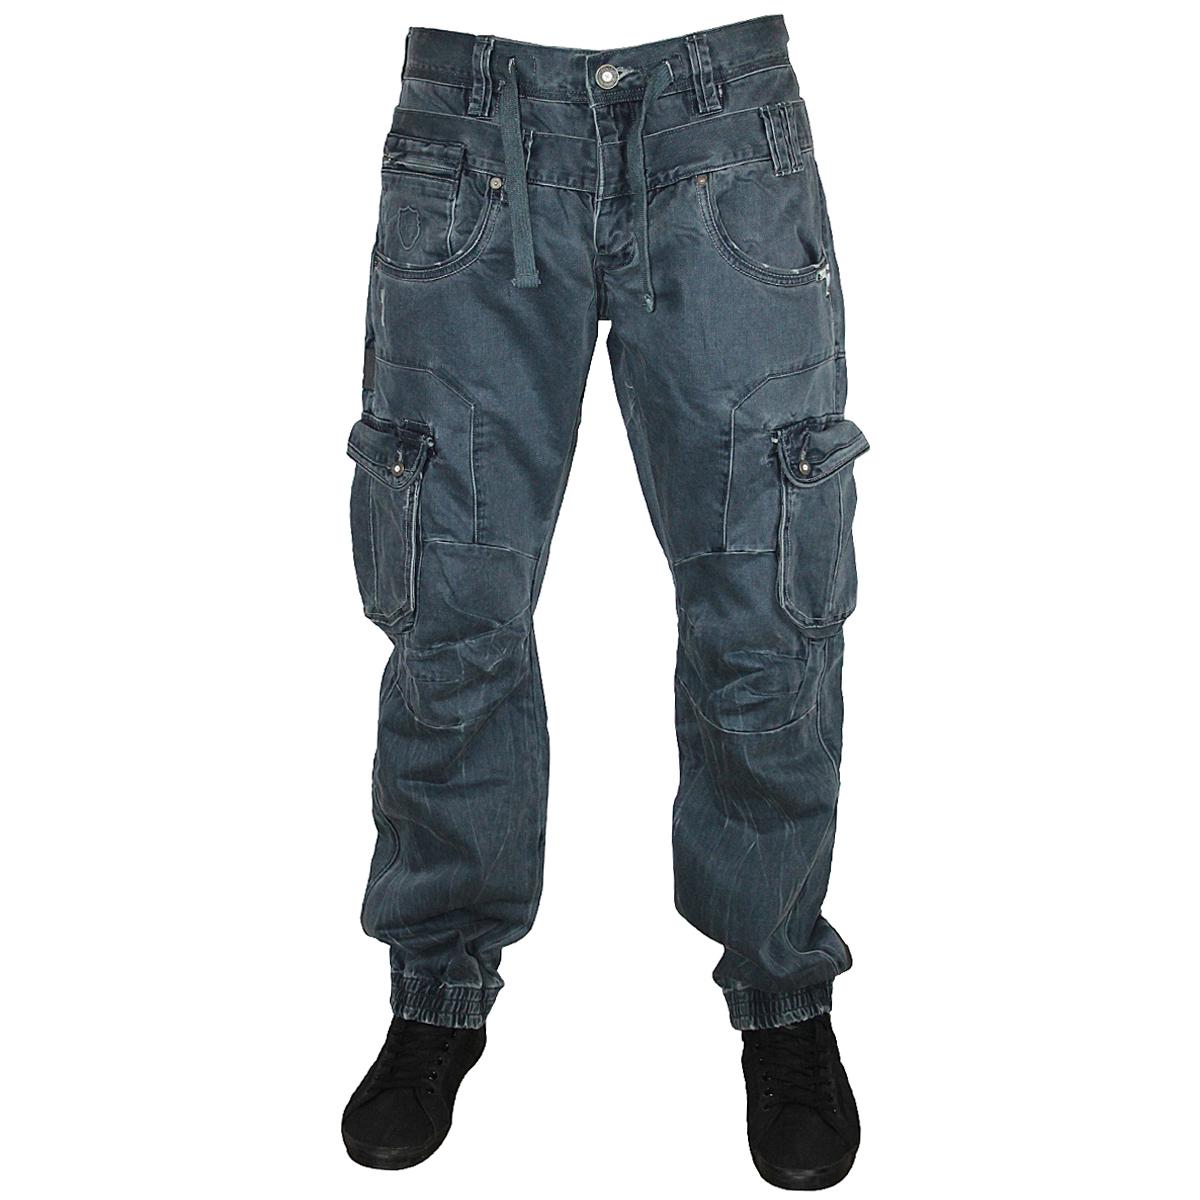 Wax Denim Jeans Men